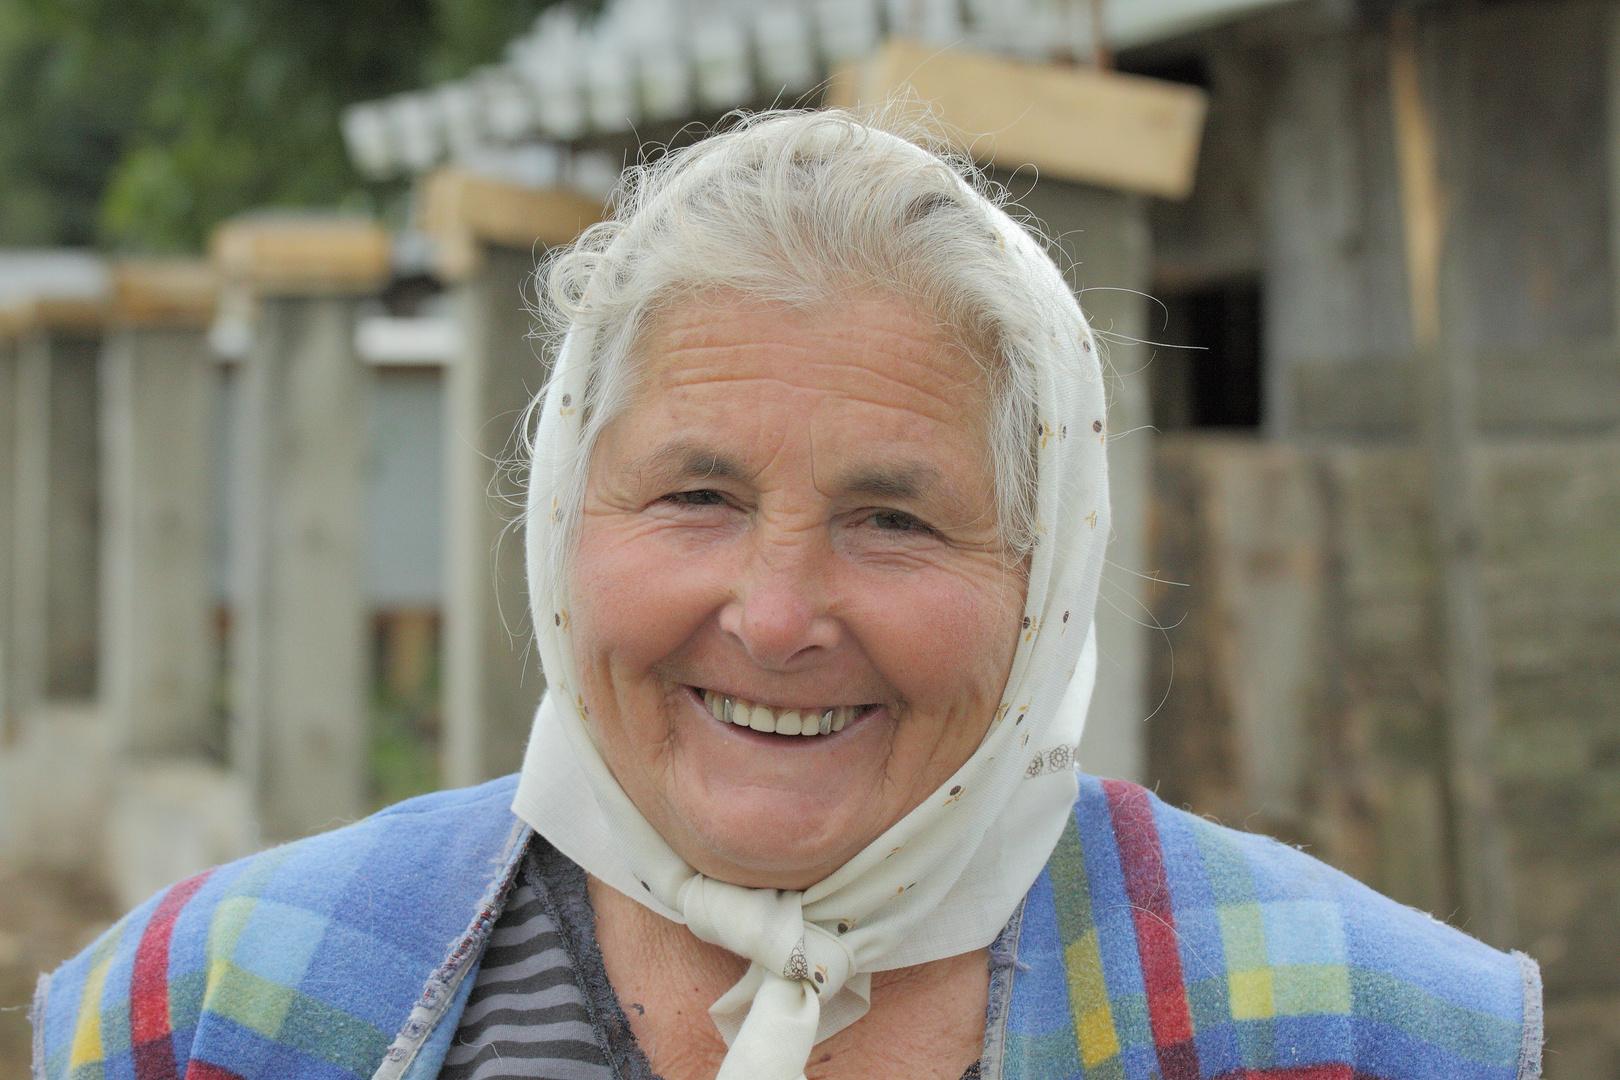 Bäuerin in der Maramuresregion